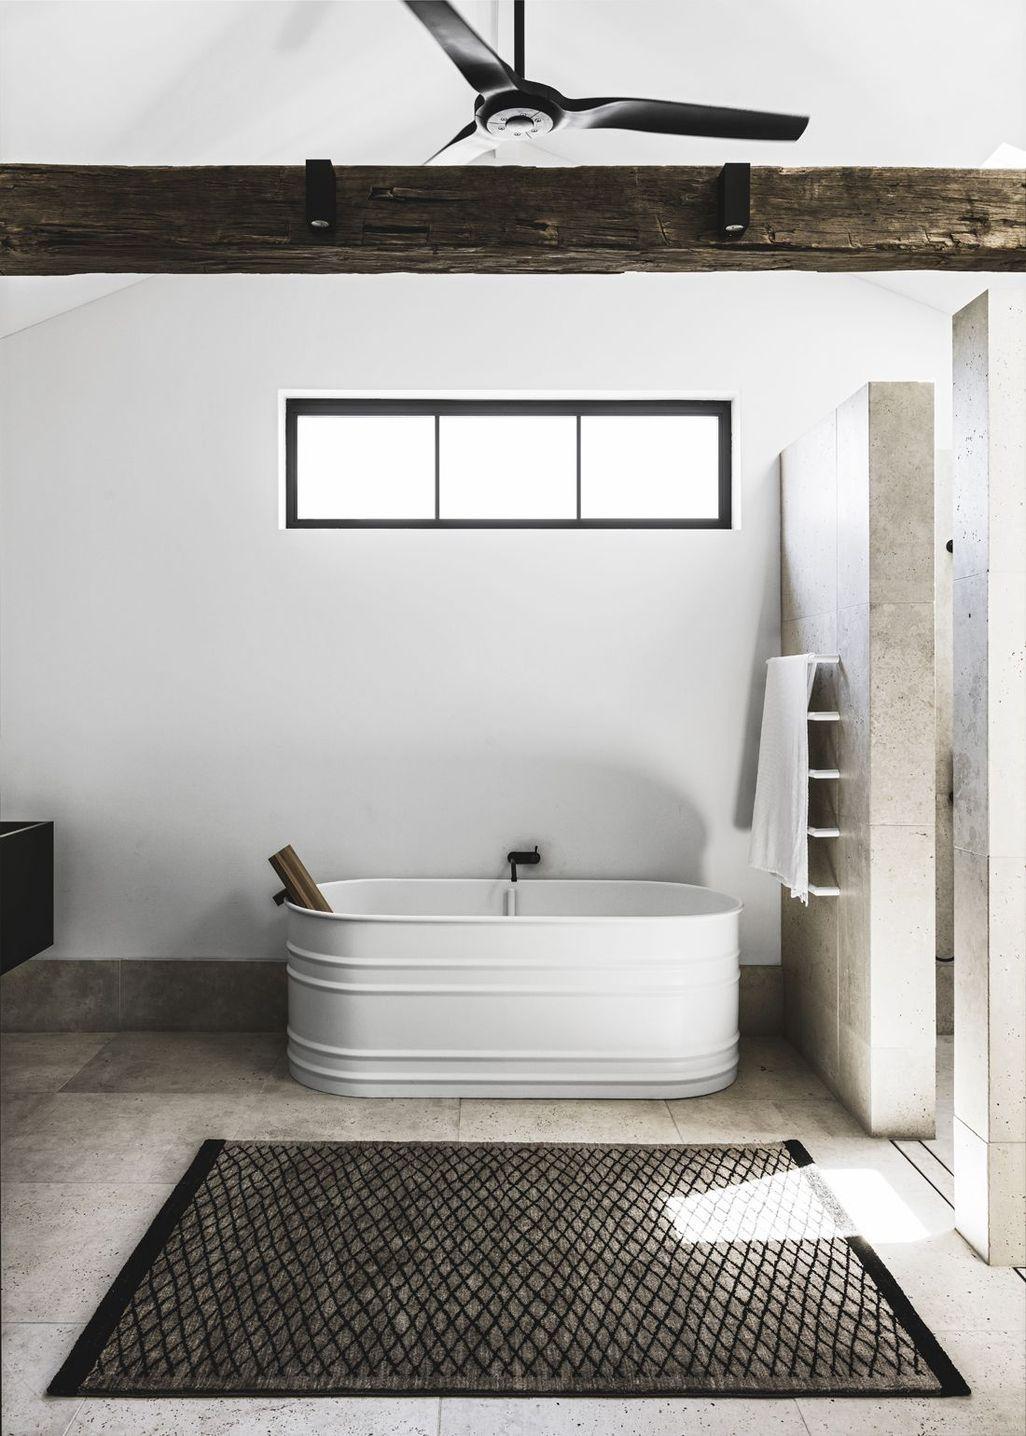 48 Stunning Spa Bathroom Design Ideas   Bathroom   Pinterest   Spa ...